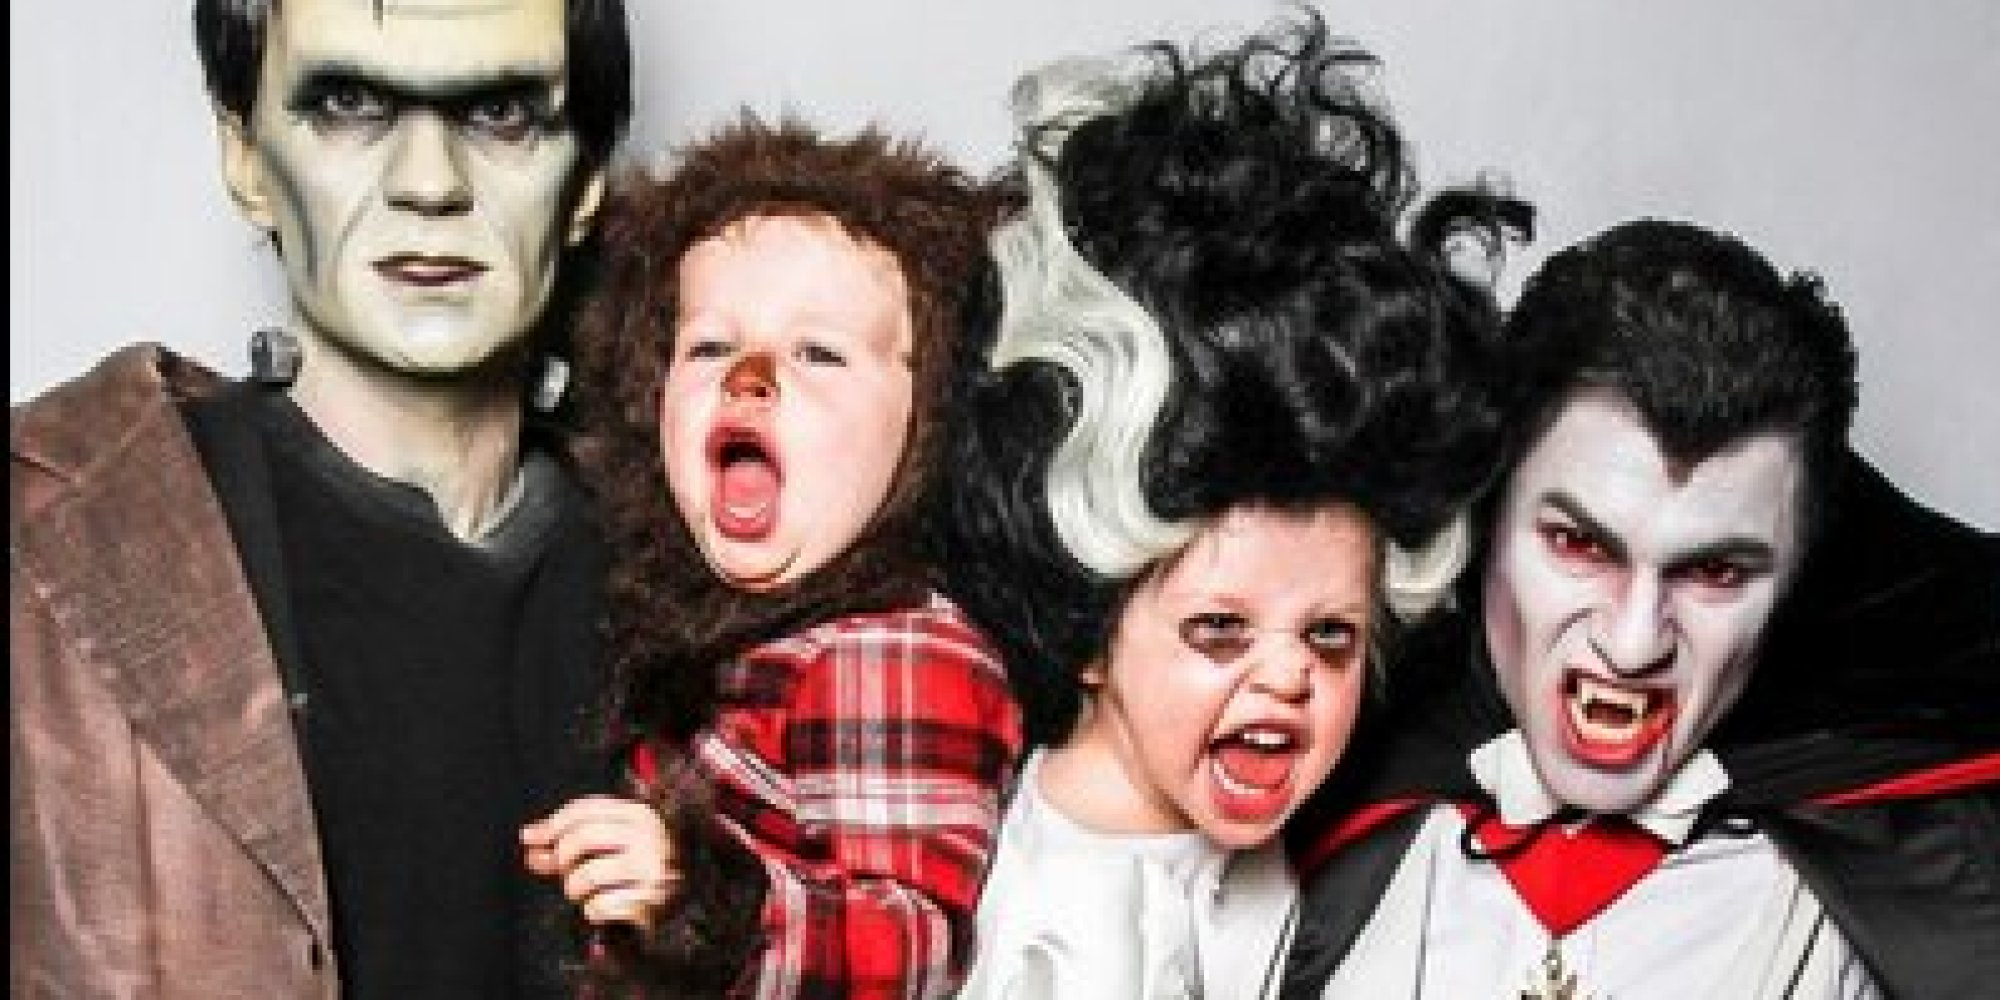 Neil Patrick Harris's Family Halloween Costume Was Even